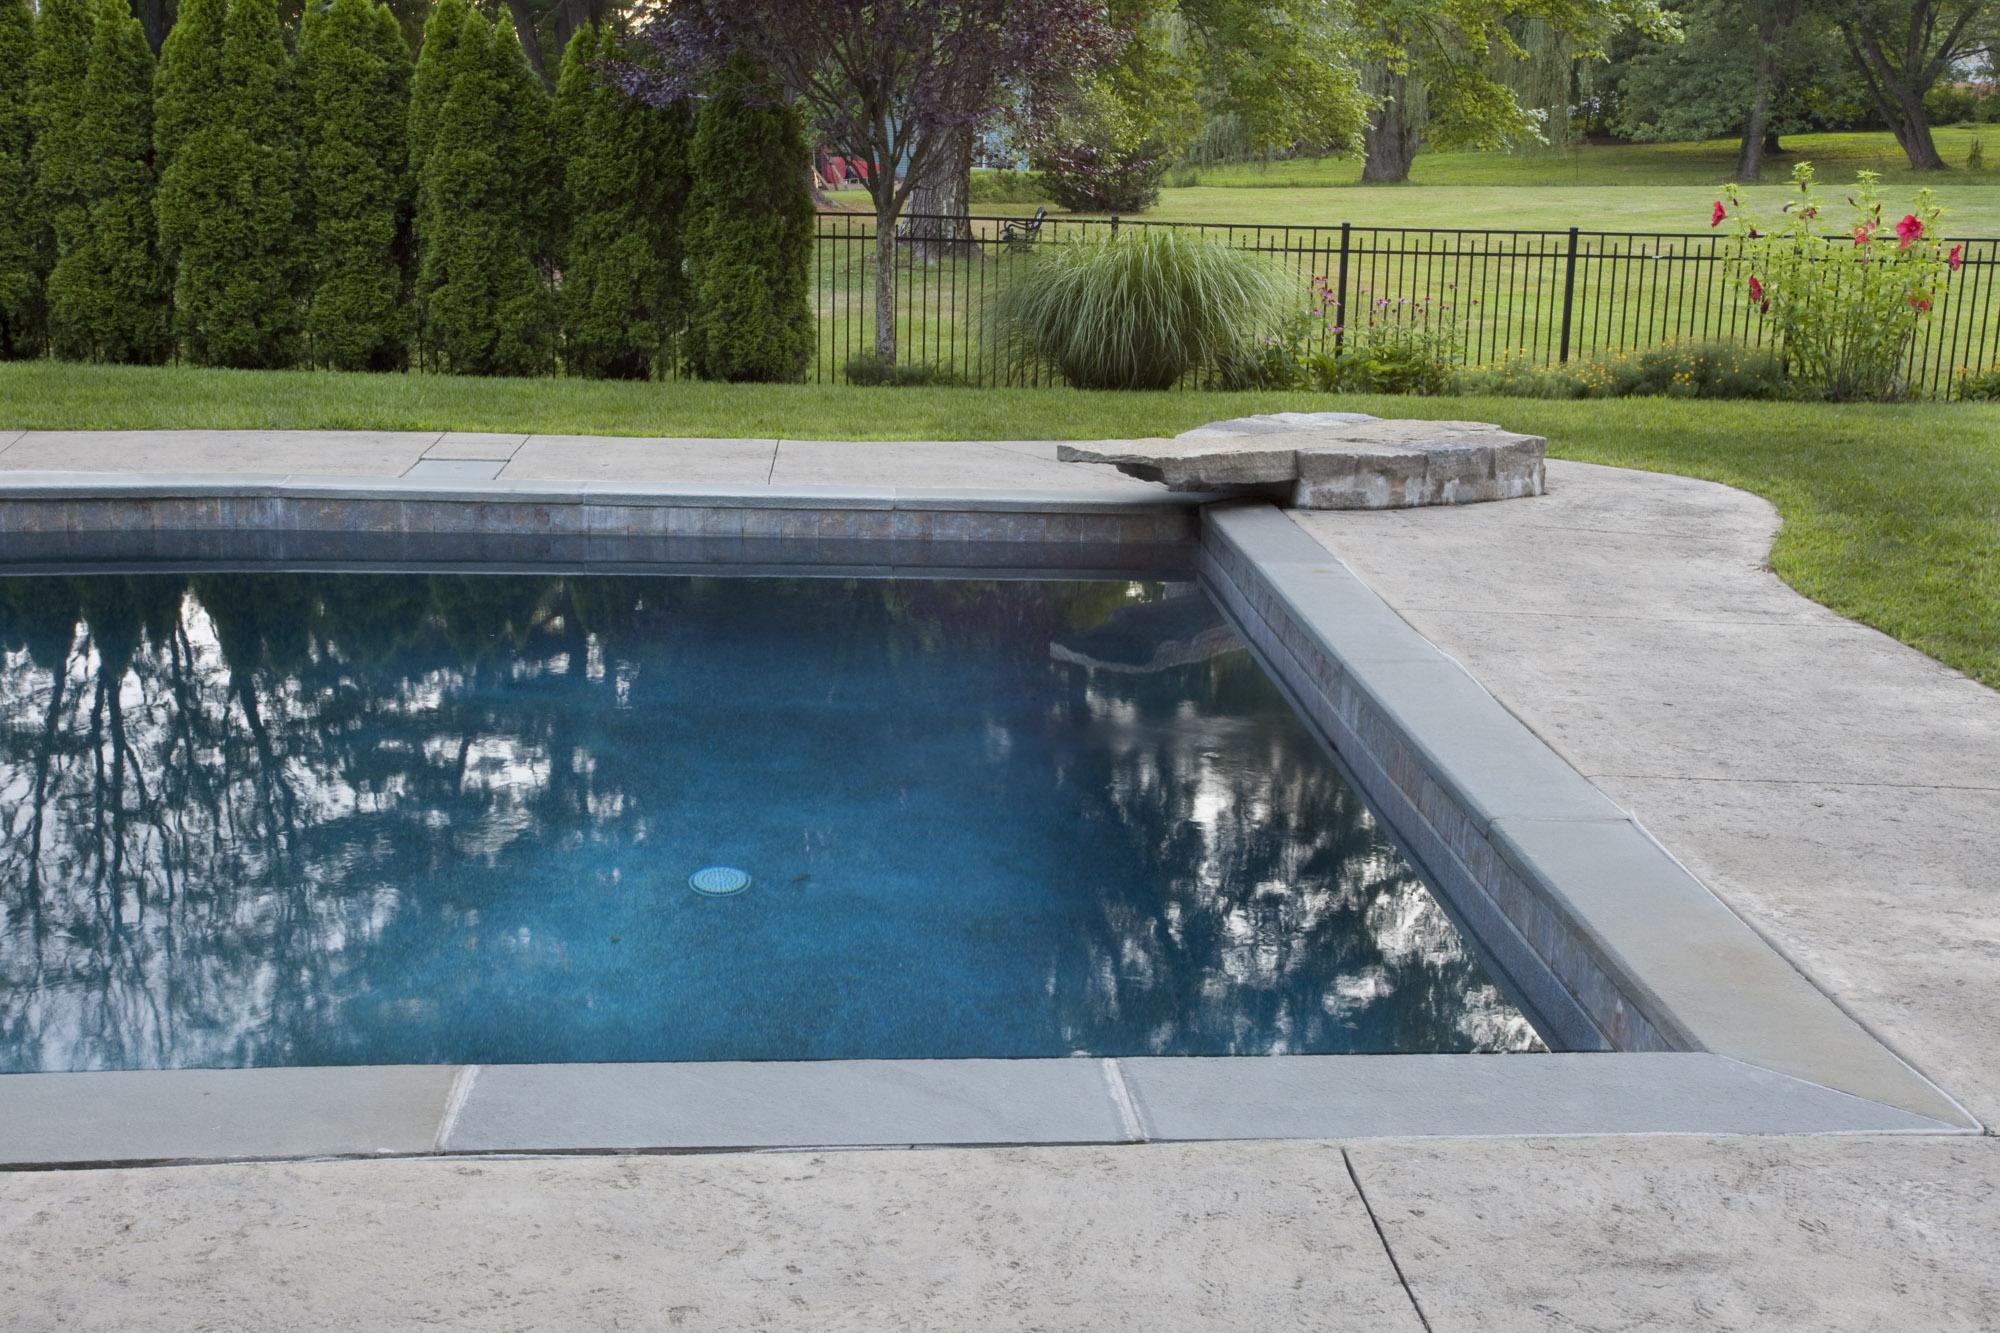 indoor pool house with diving board. 20100728_0007 Indoor Pool House With Diving Board